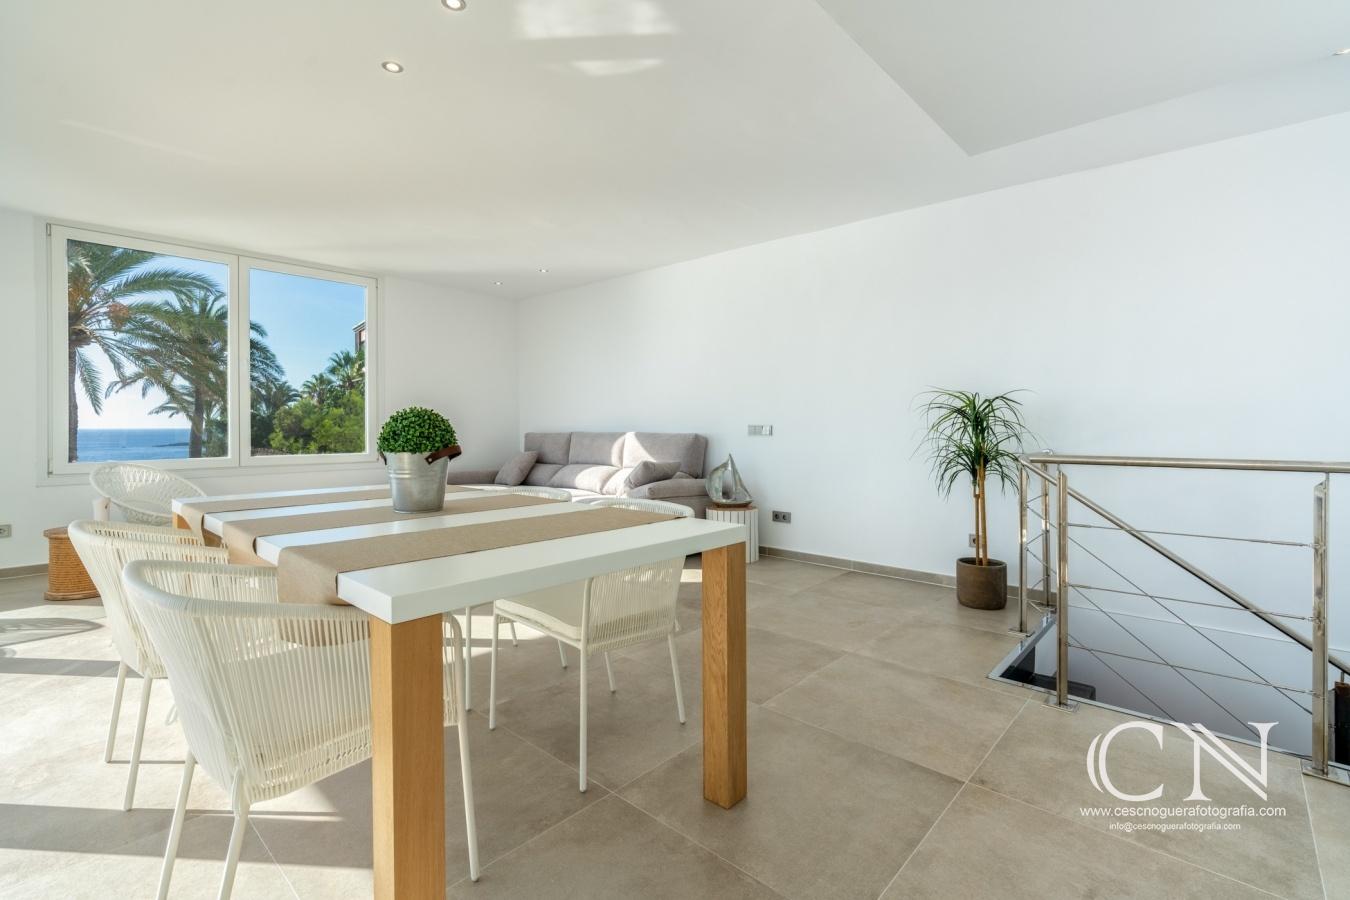 Apartament a Cala Vinyes - Cesc Noguera Fotografia, Quando la fotografia è una passione, Architectural & Interior design photographer / Landscape Photography